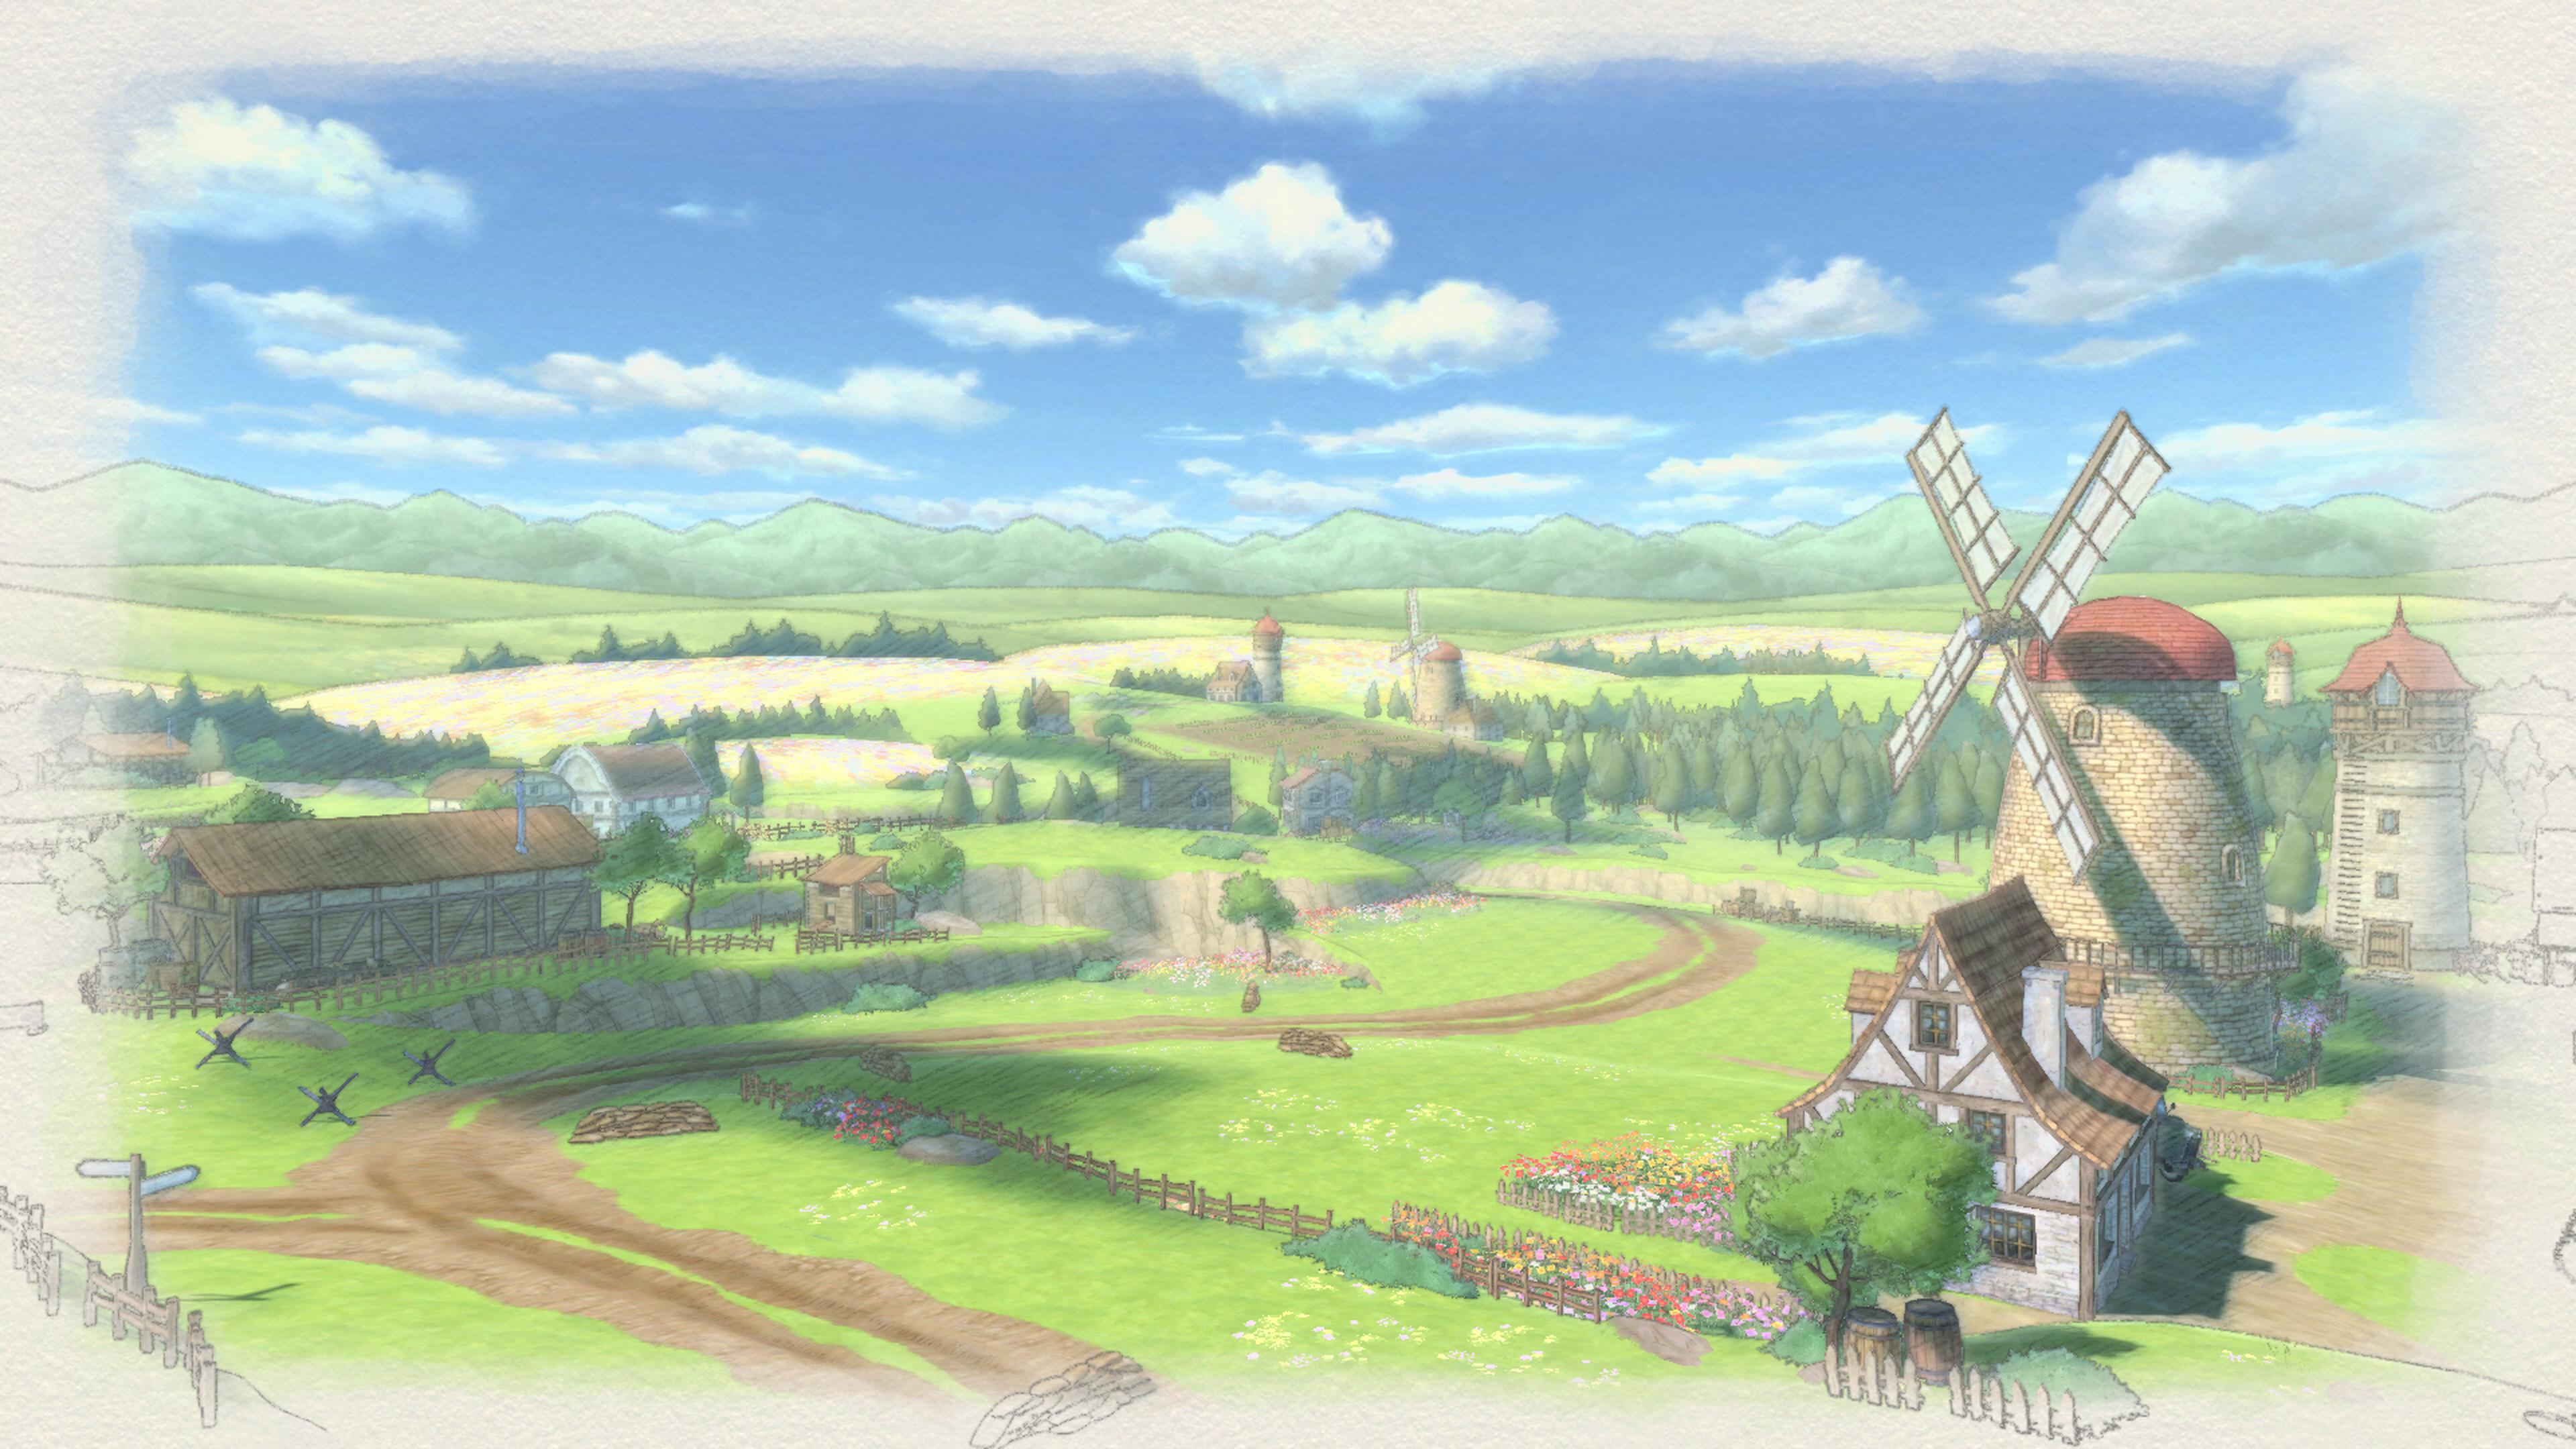 Valkyria Chronicles 4 - scenery